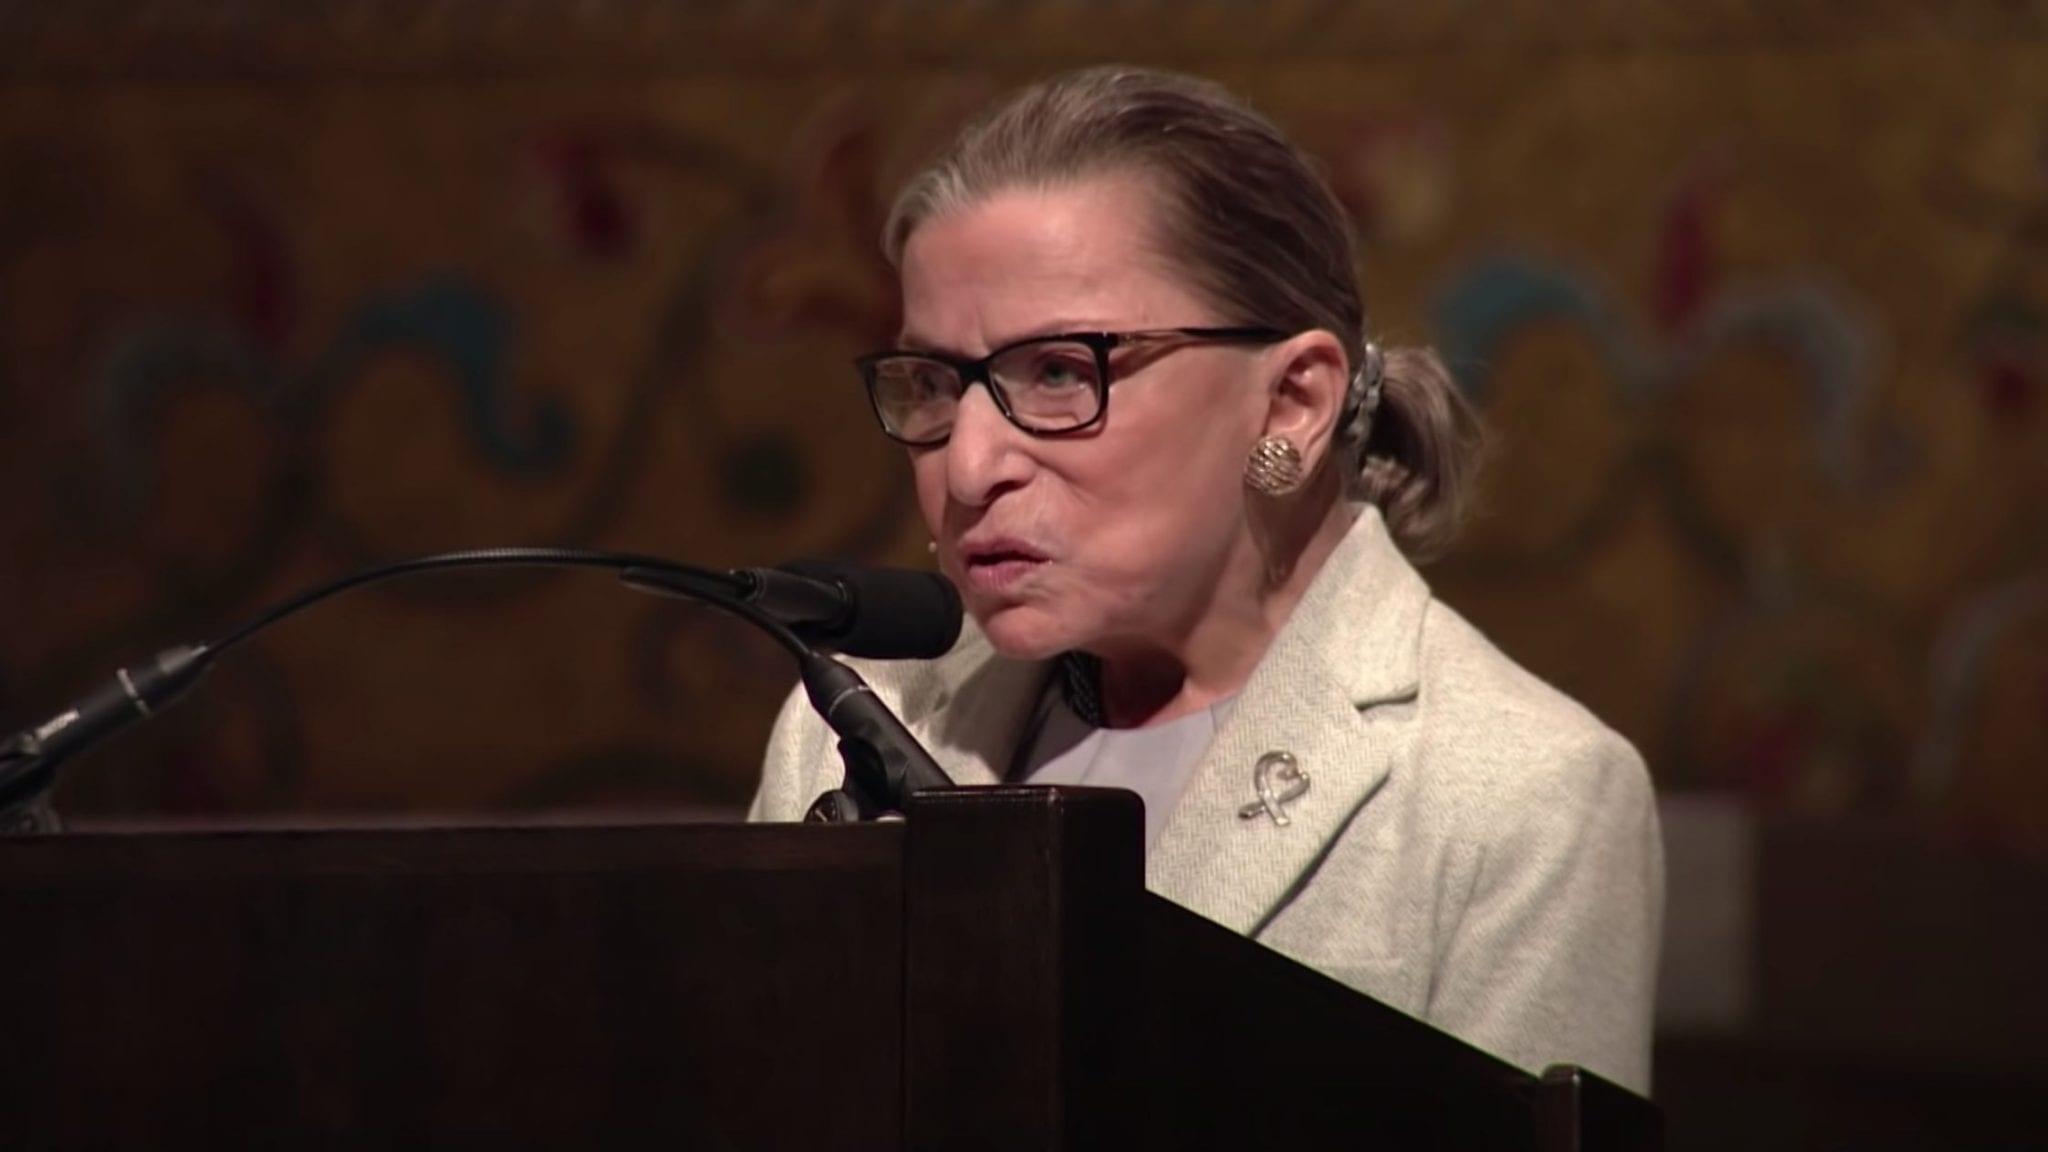 Ruth Bader Ginsburg Stanford Rathbun Lecture 2017